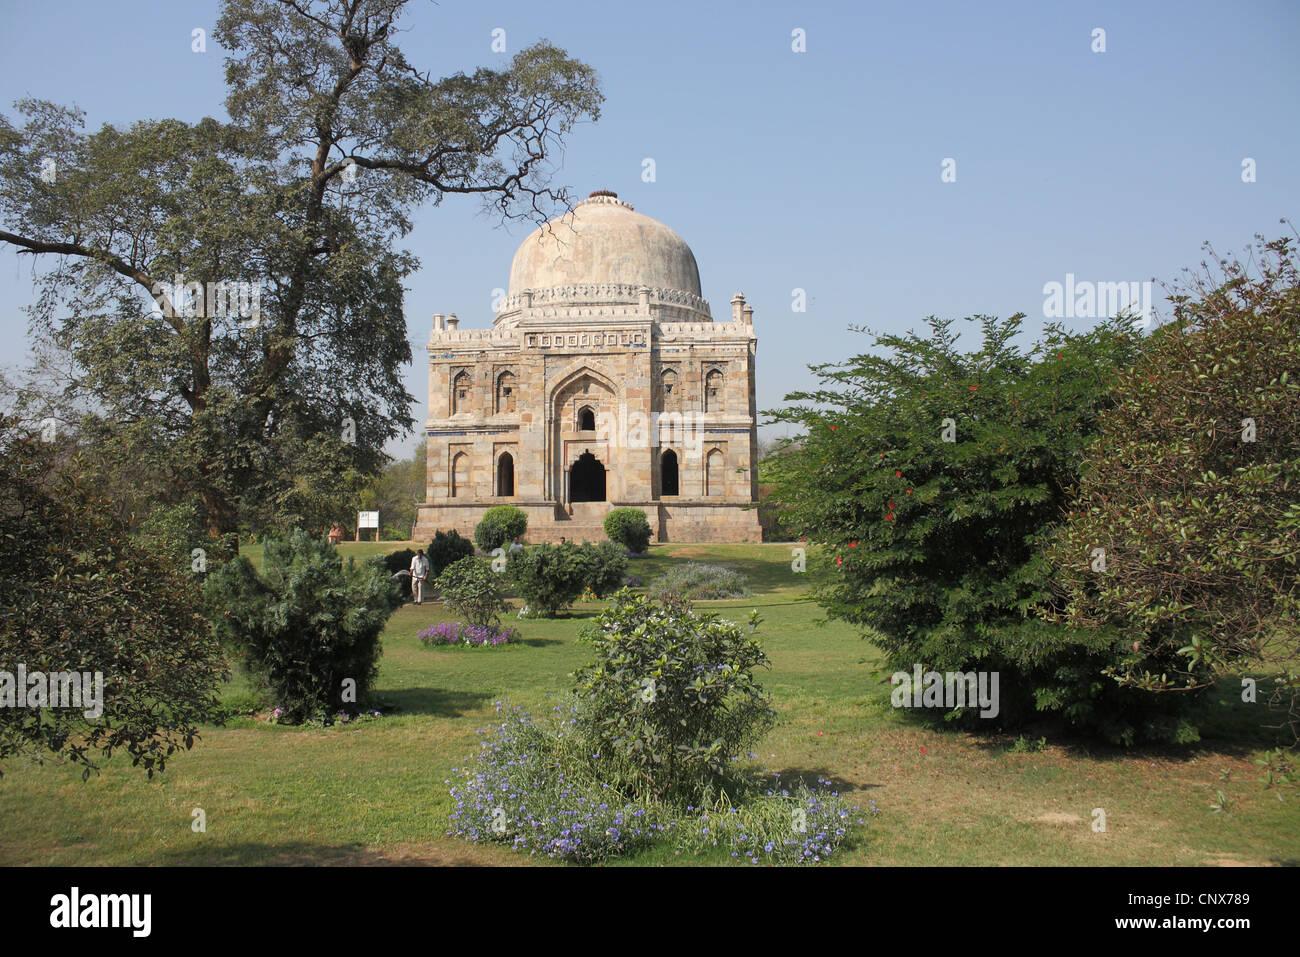 ancient monument in Lodi gardens new Delhi India - Stock Image